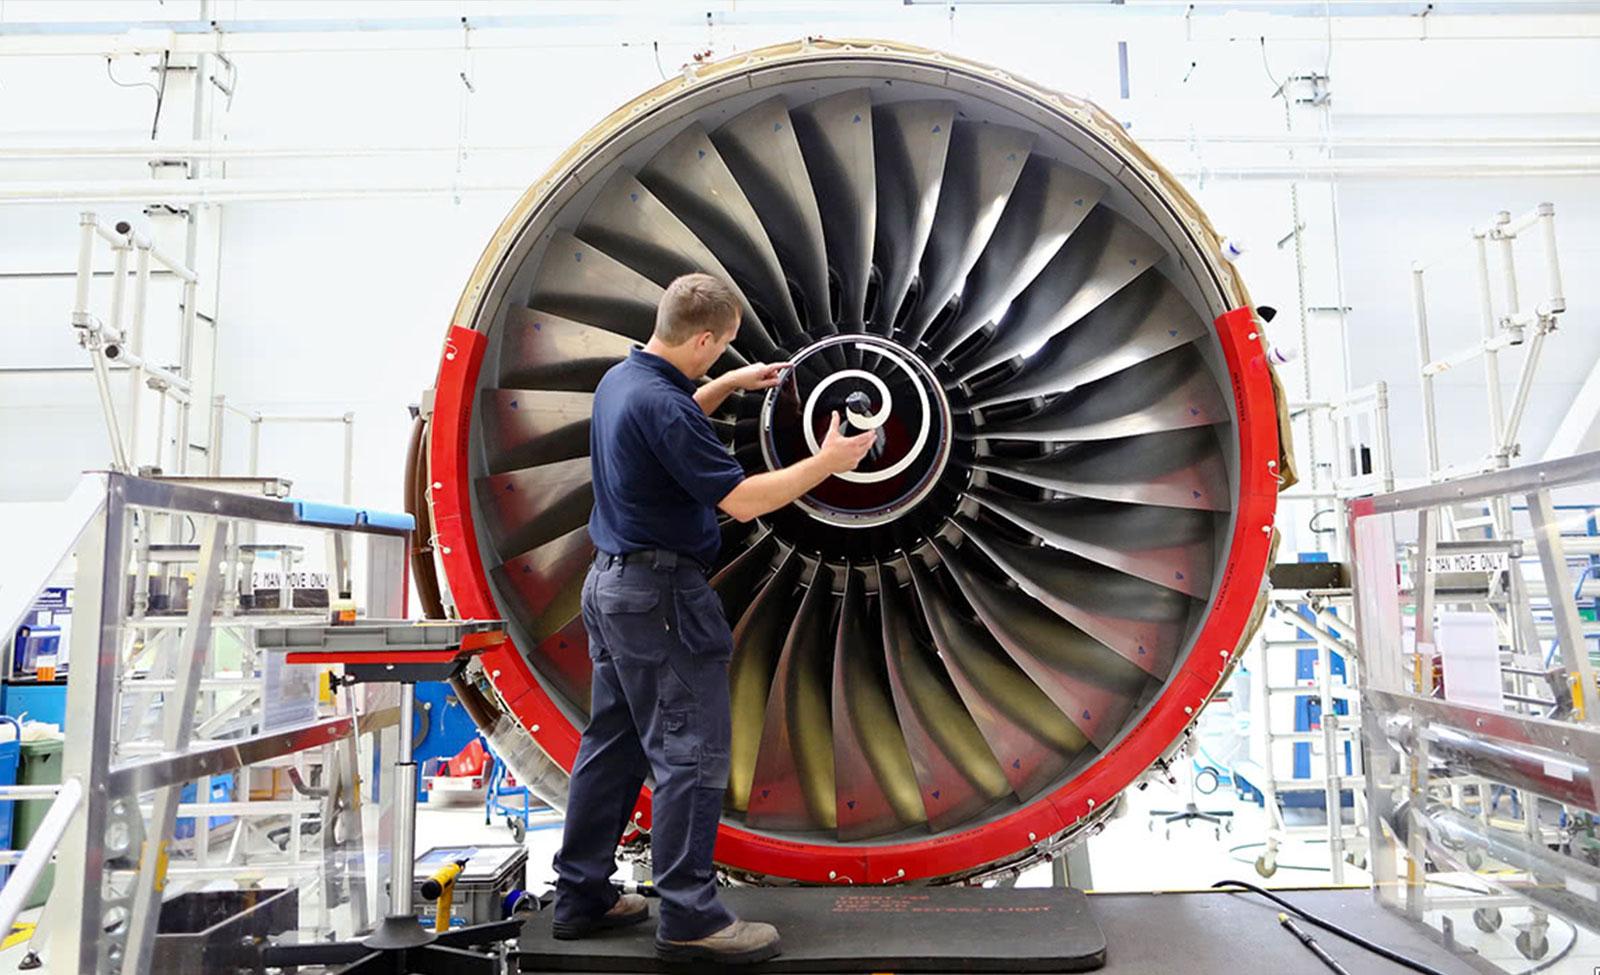 Licenza manutentore aeronautico corso B1.1.1